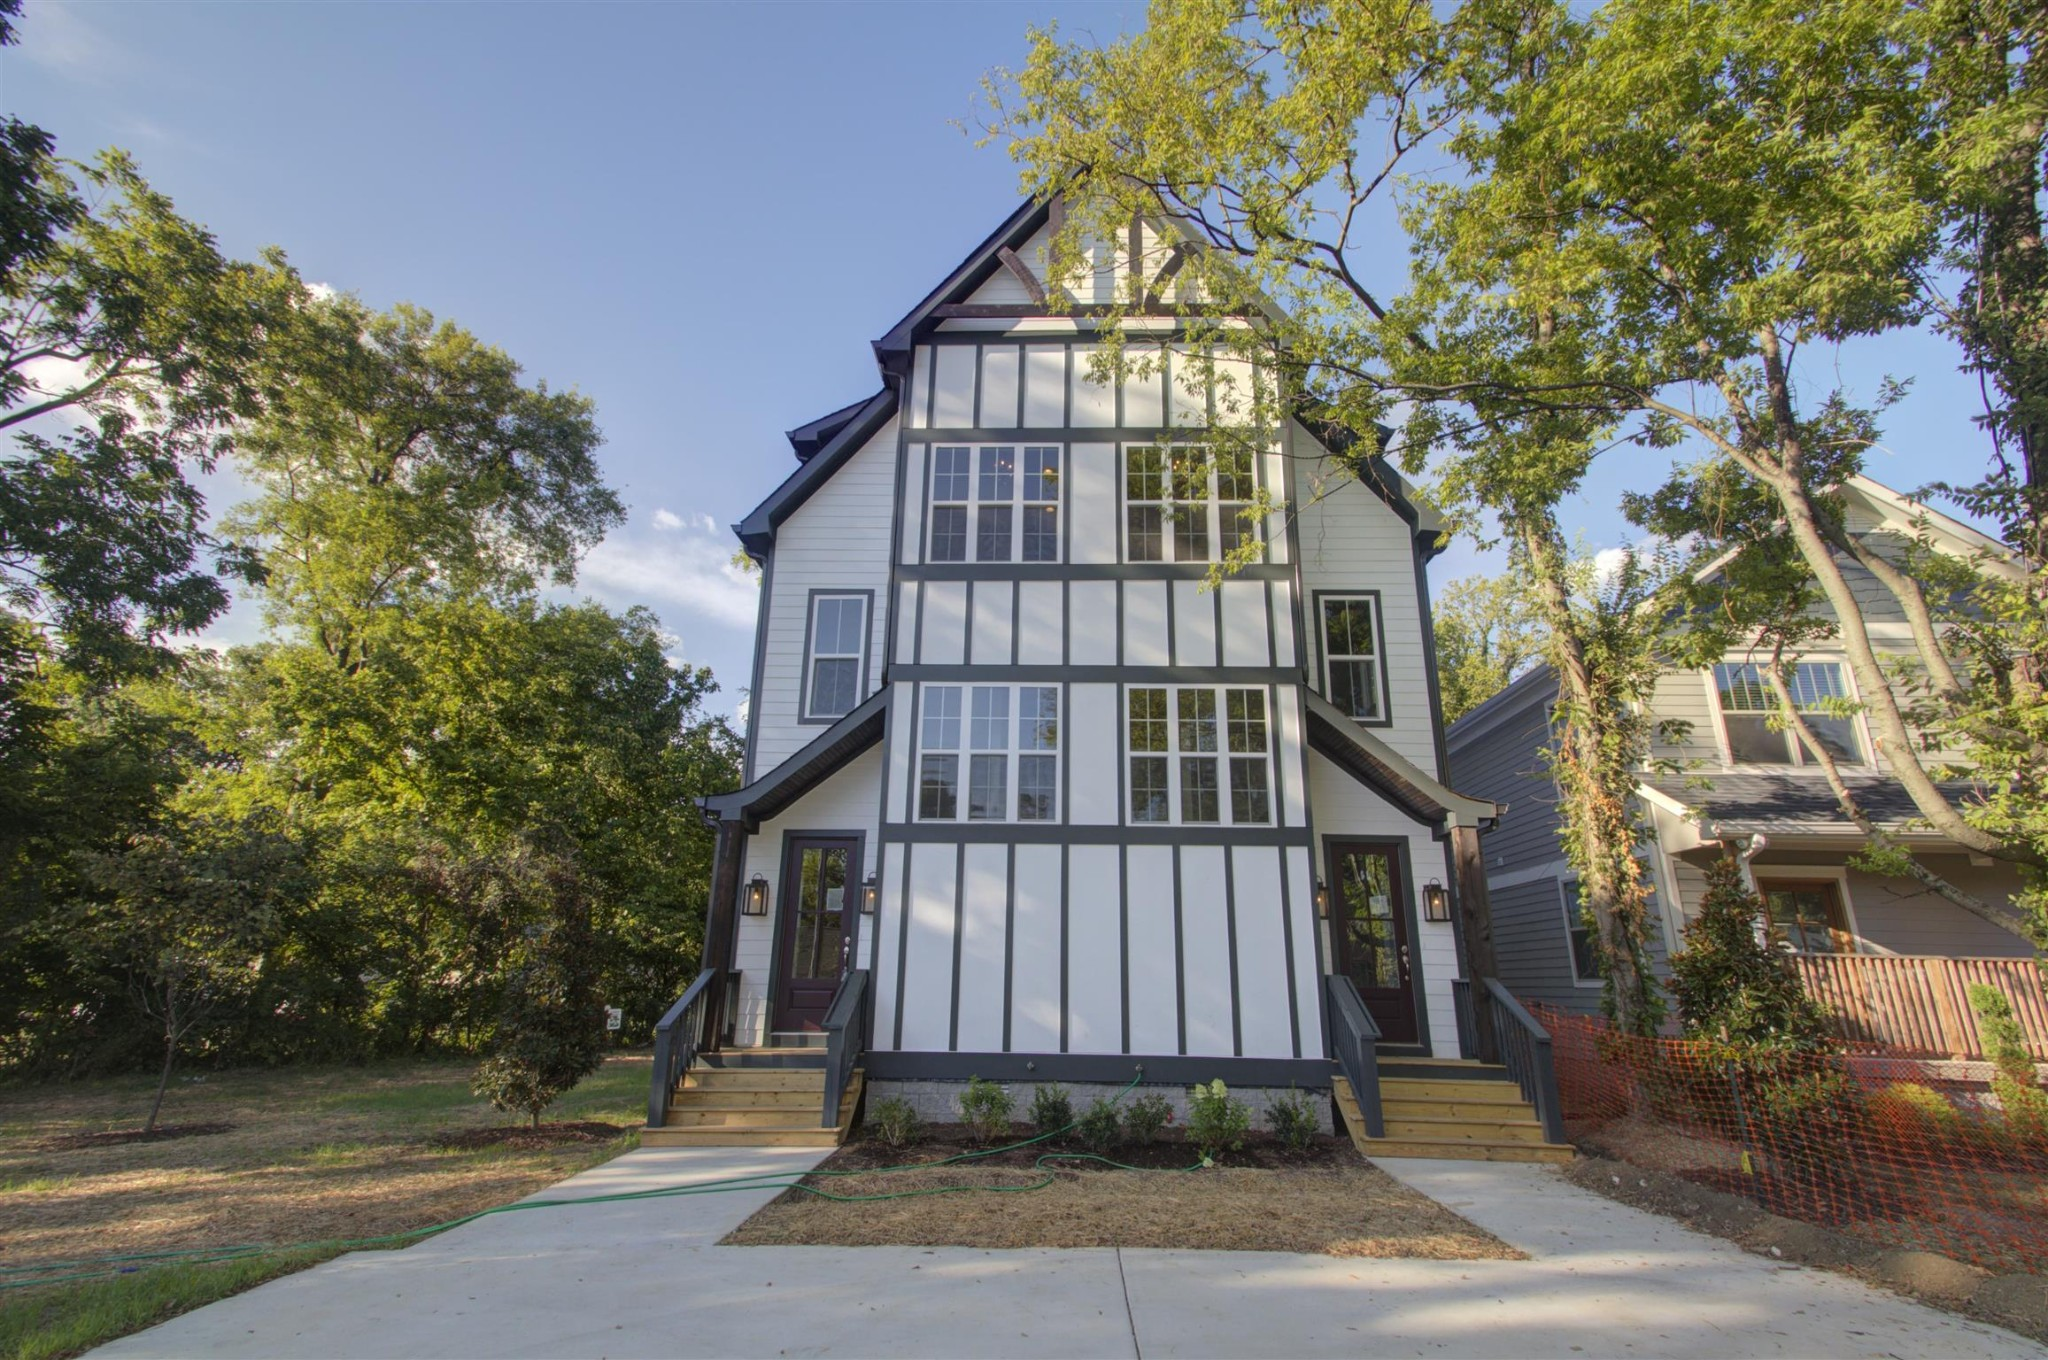 911 Cahal Ave, Nashville, TN 37206 - Nashville, TN real estate listing